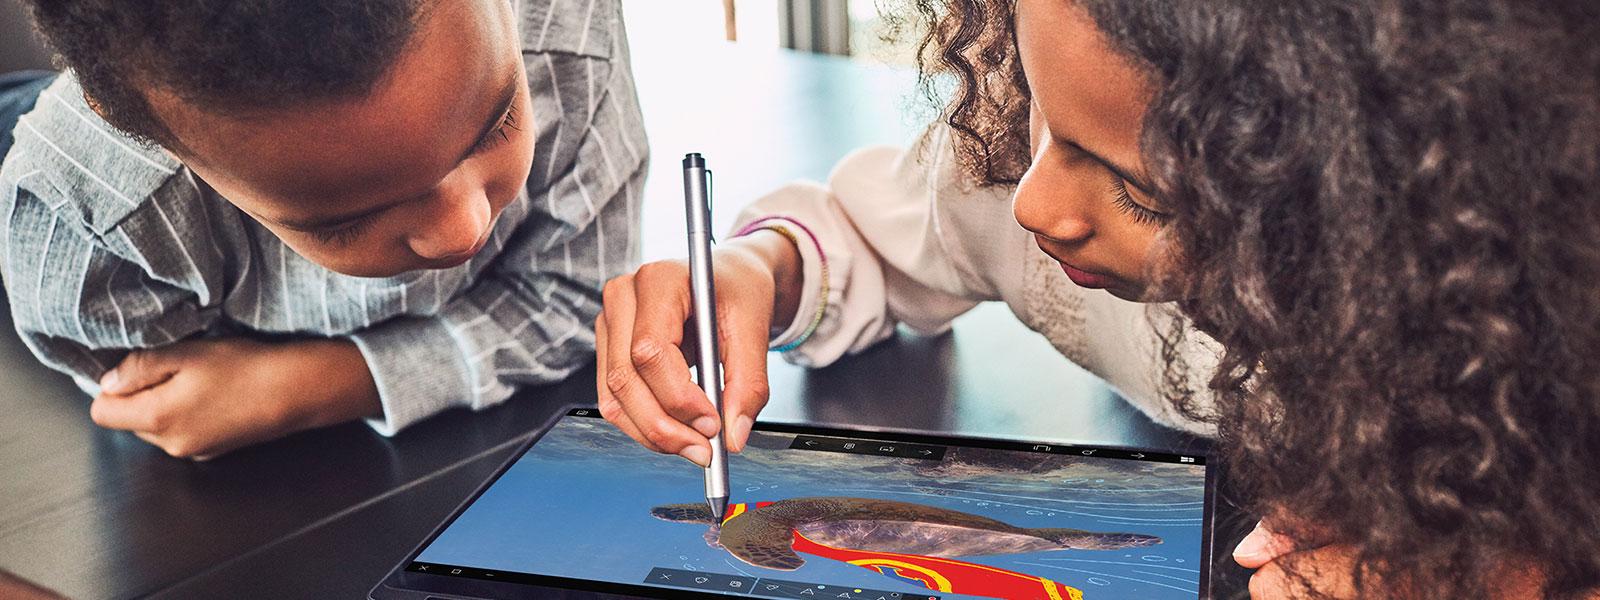 Barn som tegner med Windows ink